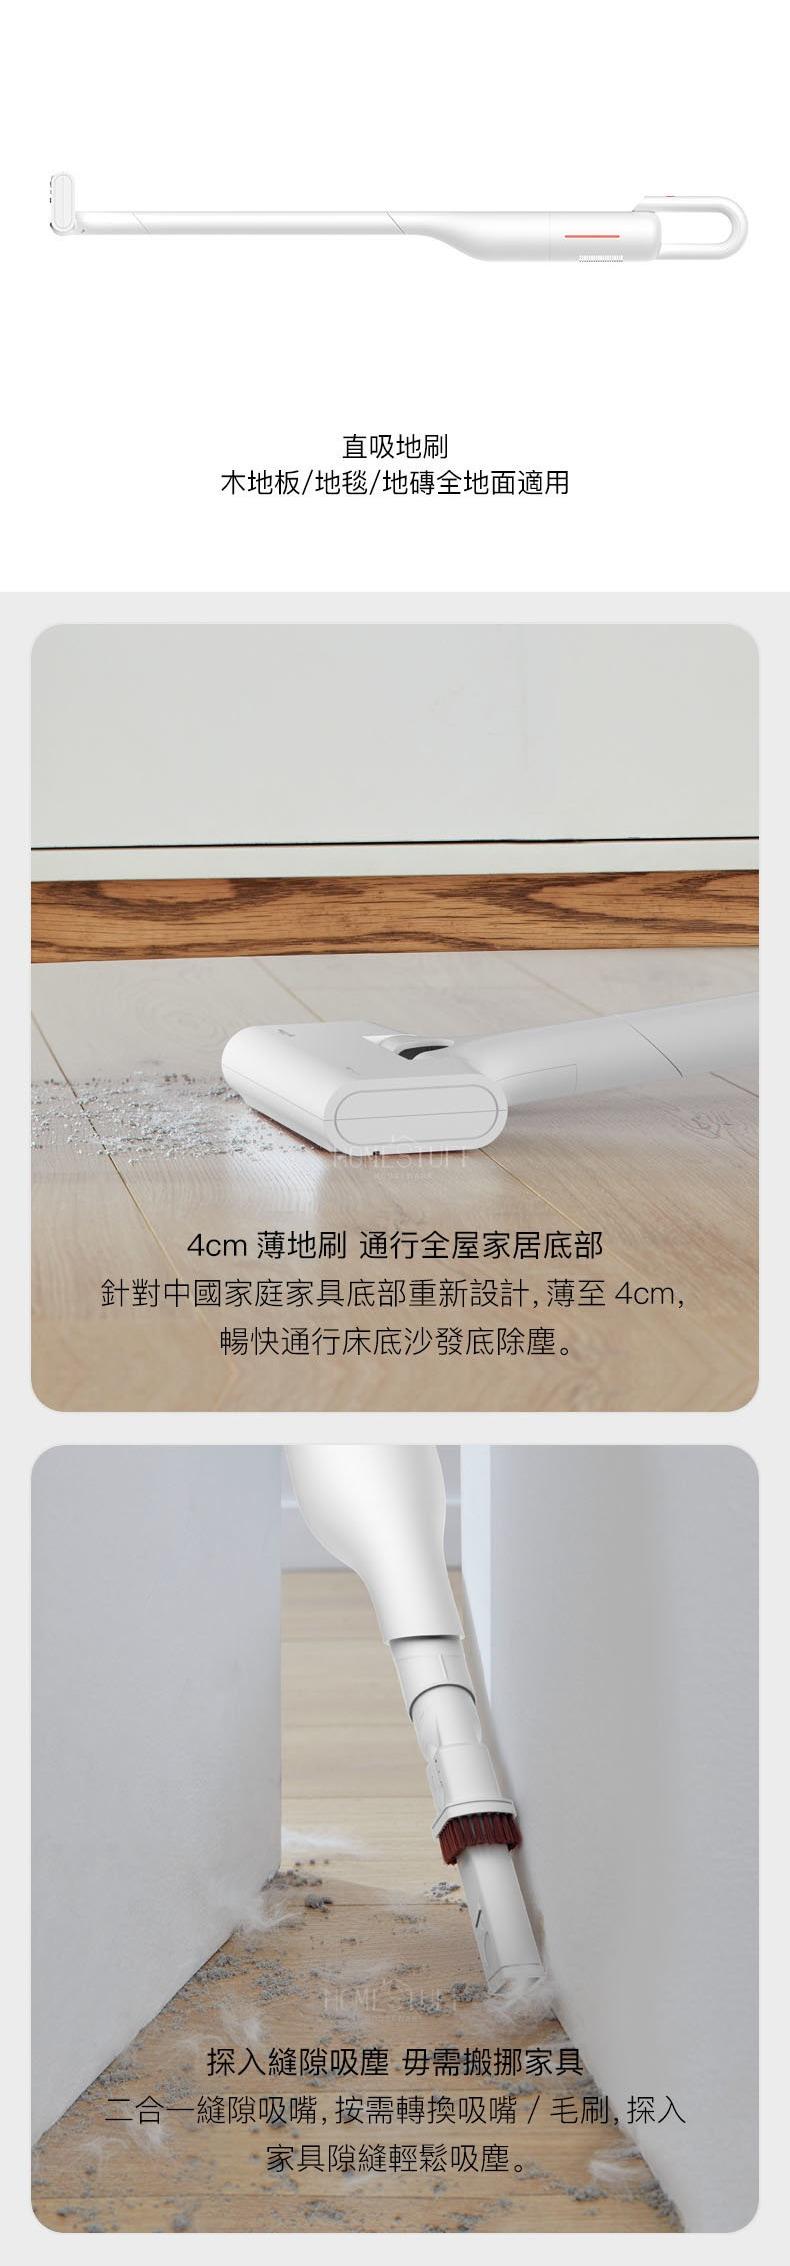 Deerma 無線手持式吸塵器 超輕大吸力吸塵機 Type-C 香港特別版 (DC1000)